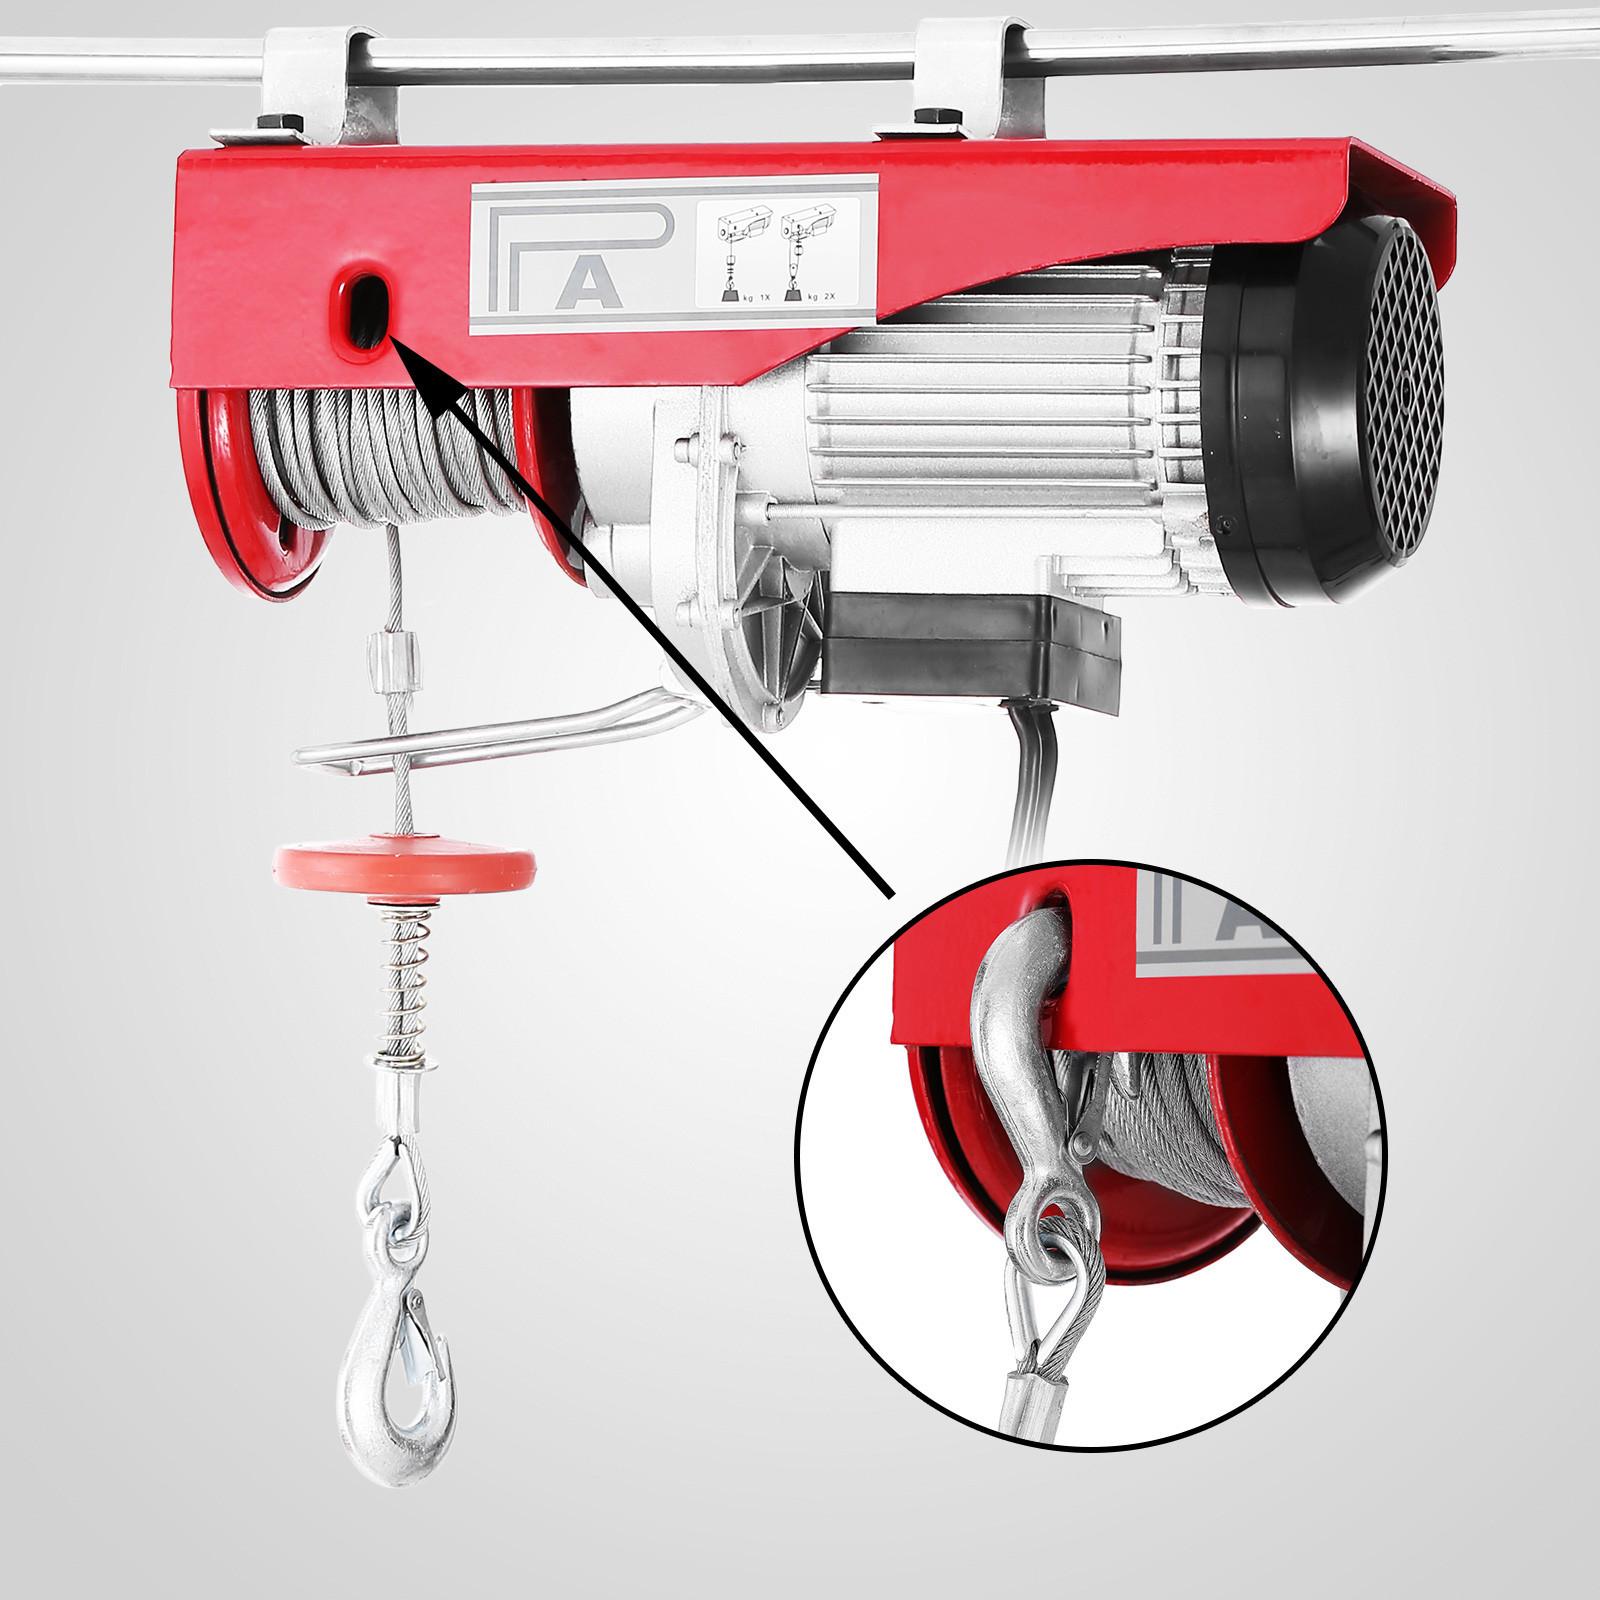 100kg-900kg-Electric-Hoist-Winch-Lifting-Engine-Crane-Cable-Lift-Hook-Garage miniature 48